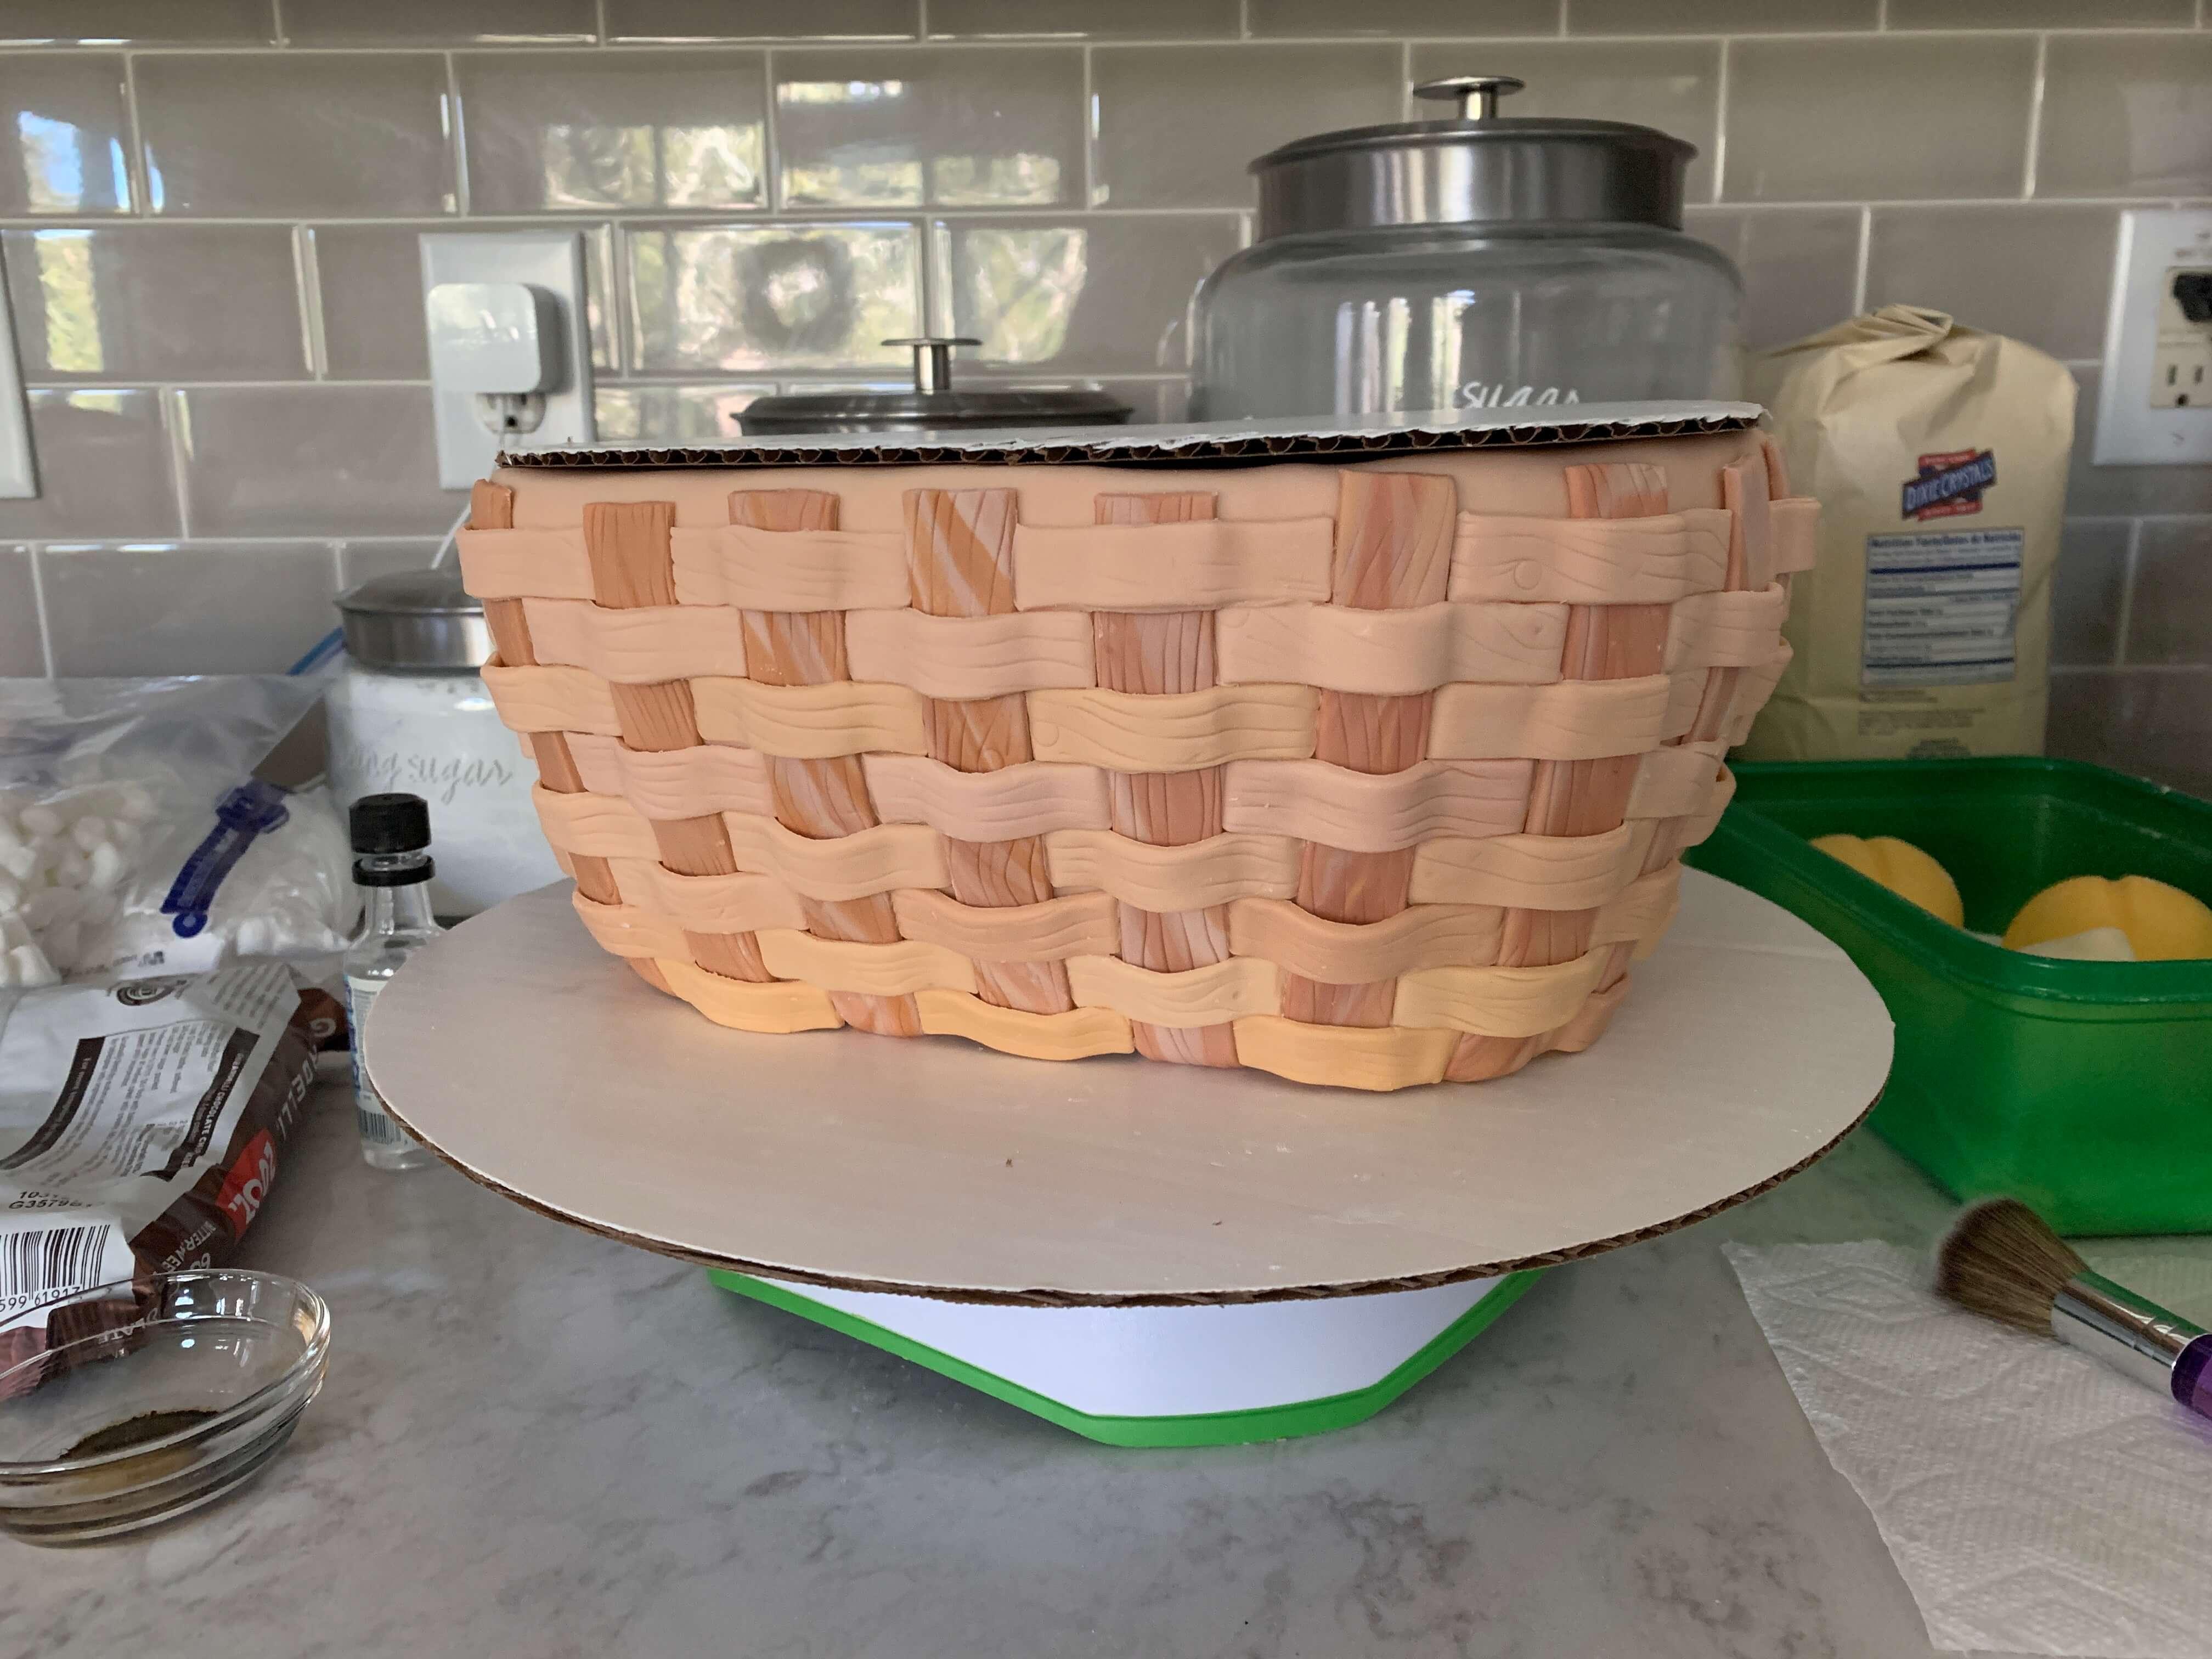 Weaving Details on the Basket Cake